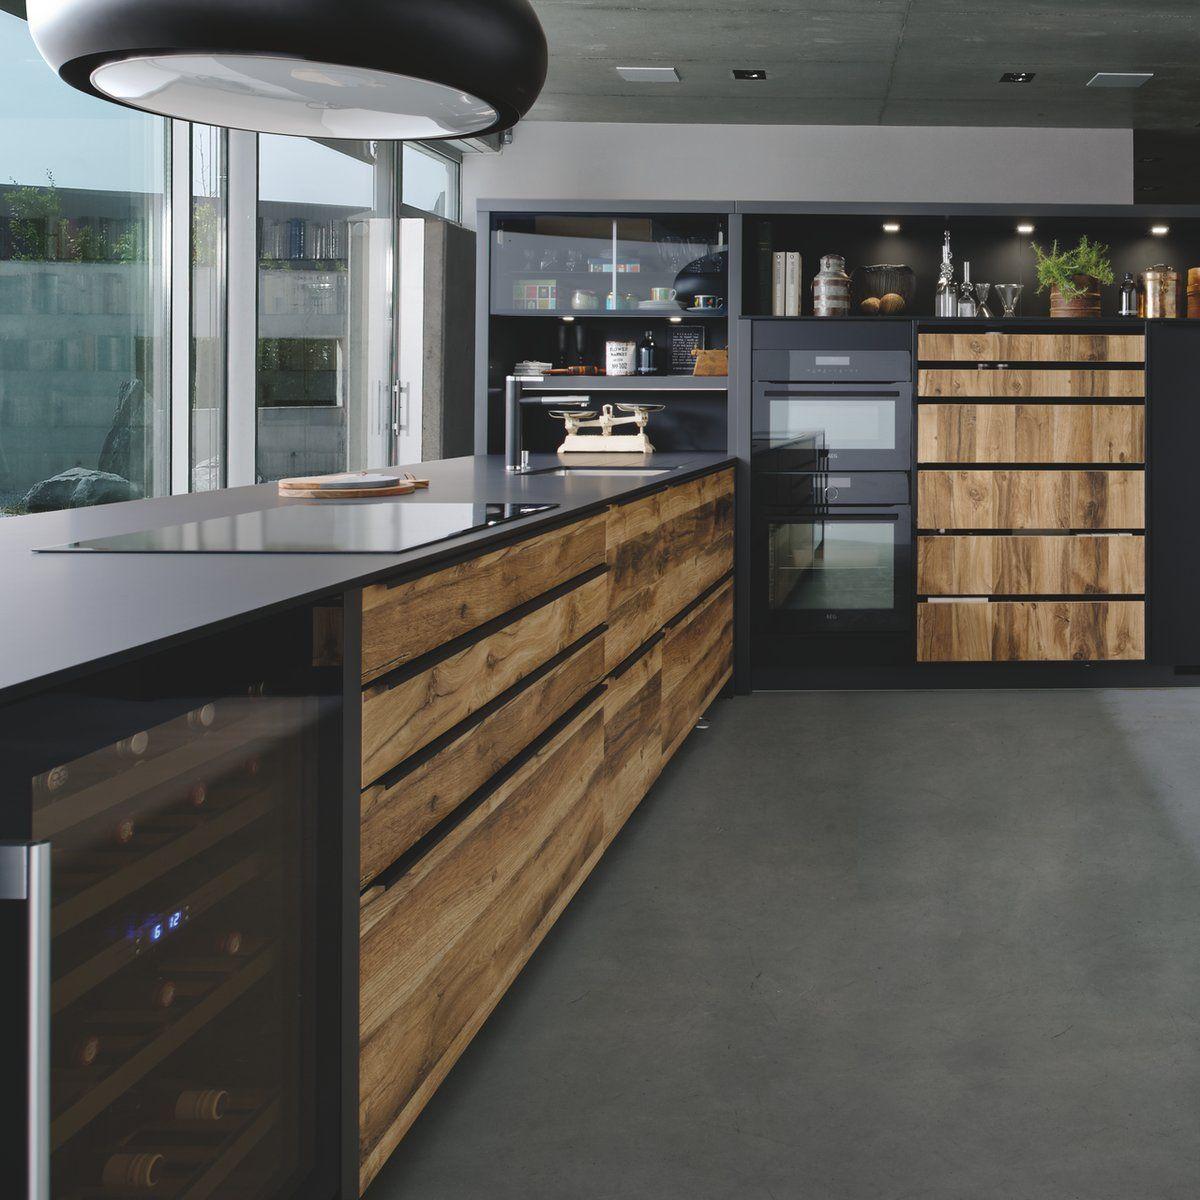 Soldes Schmidt Avec Images Cuisine Moderne Idee Deco